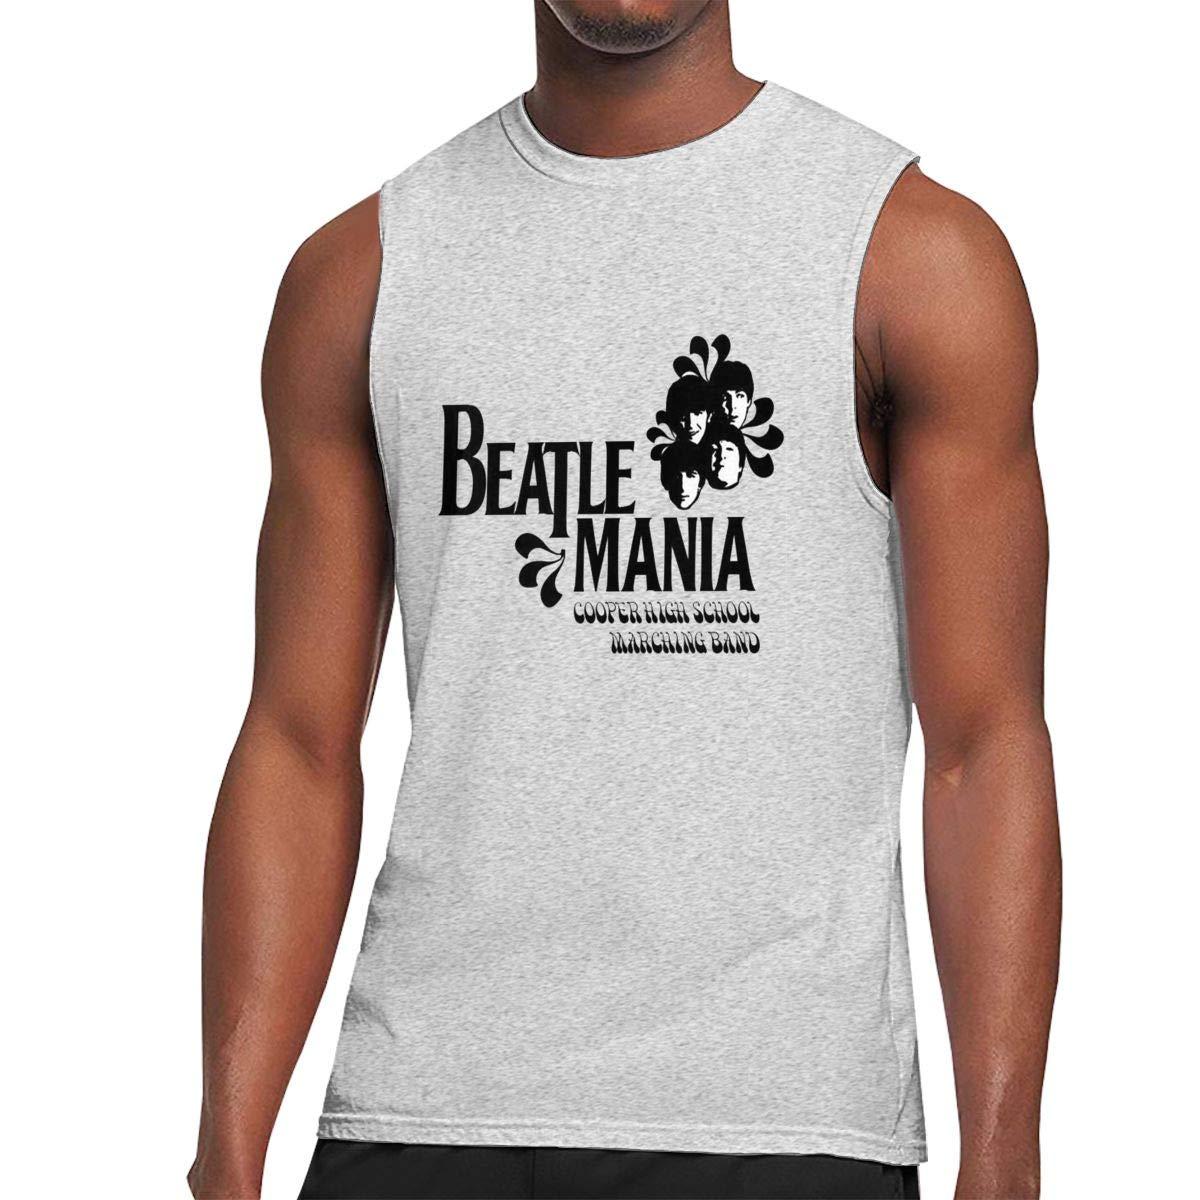 Hughhd Kirkid Mens Tank Top T Shirt The Beatles Abbey Road Funny